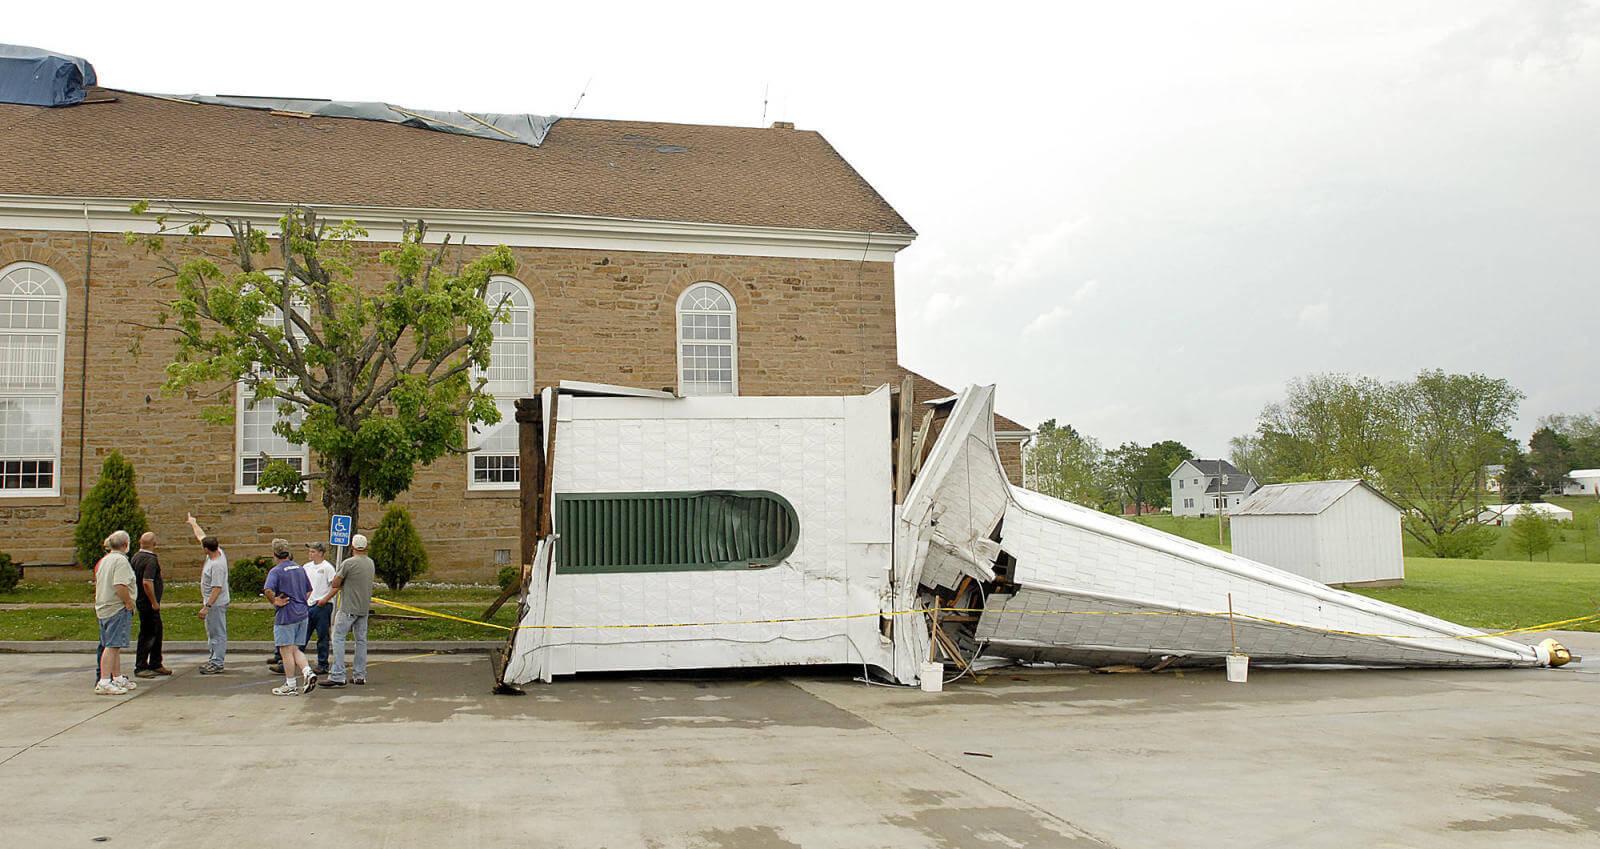 Brazoria County Windstorm Lawsuit